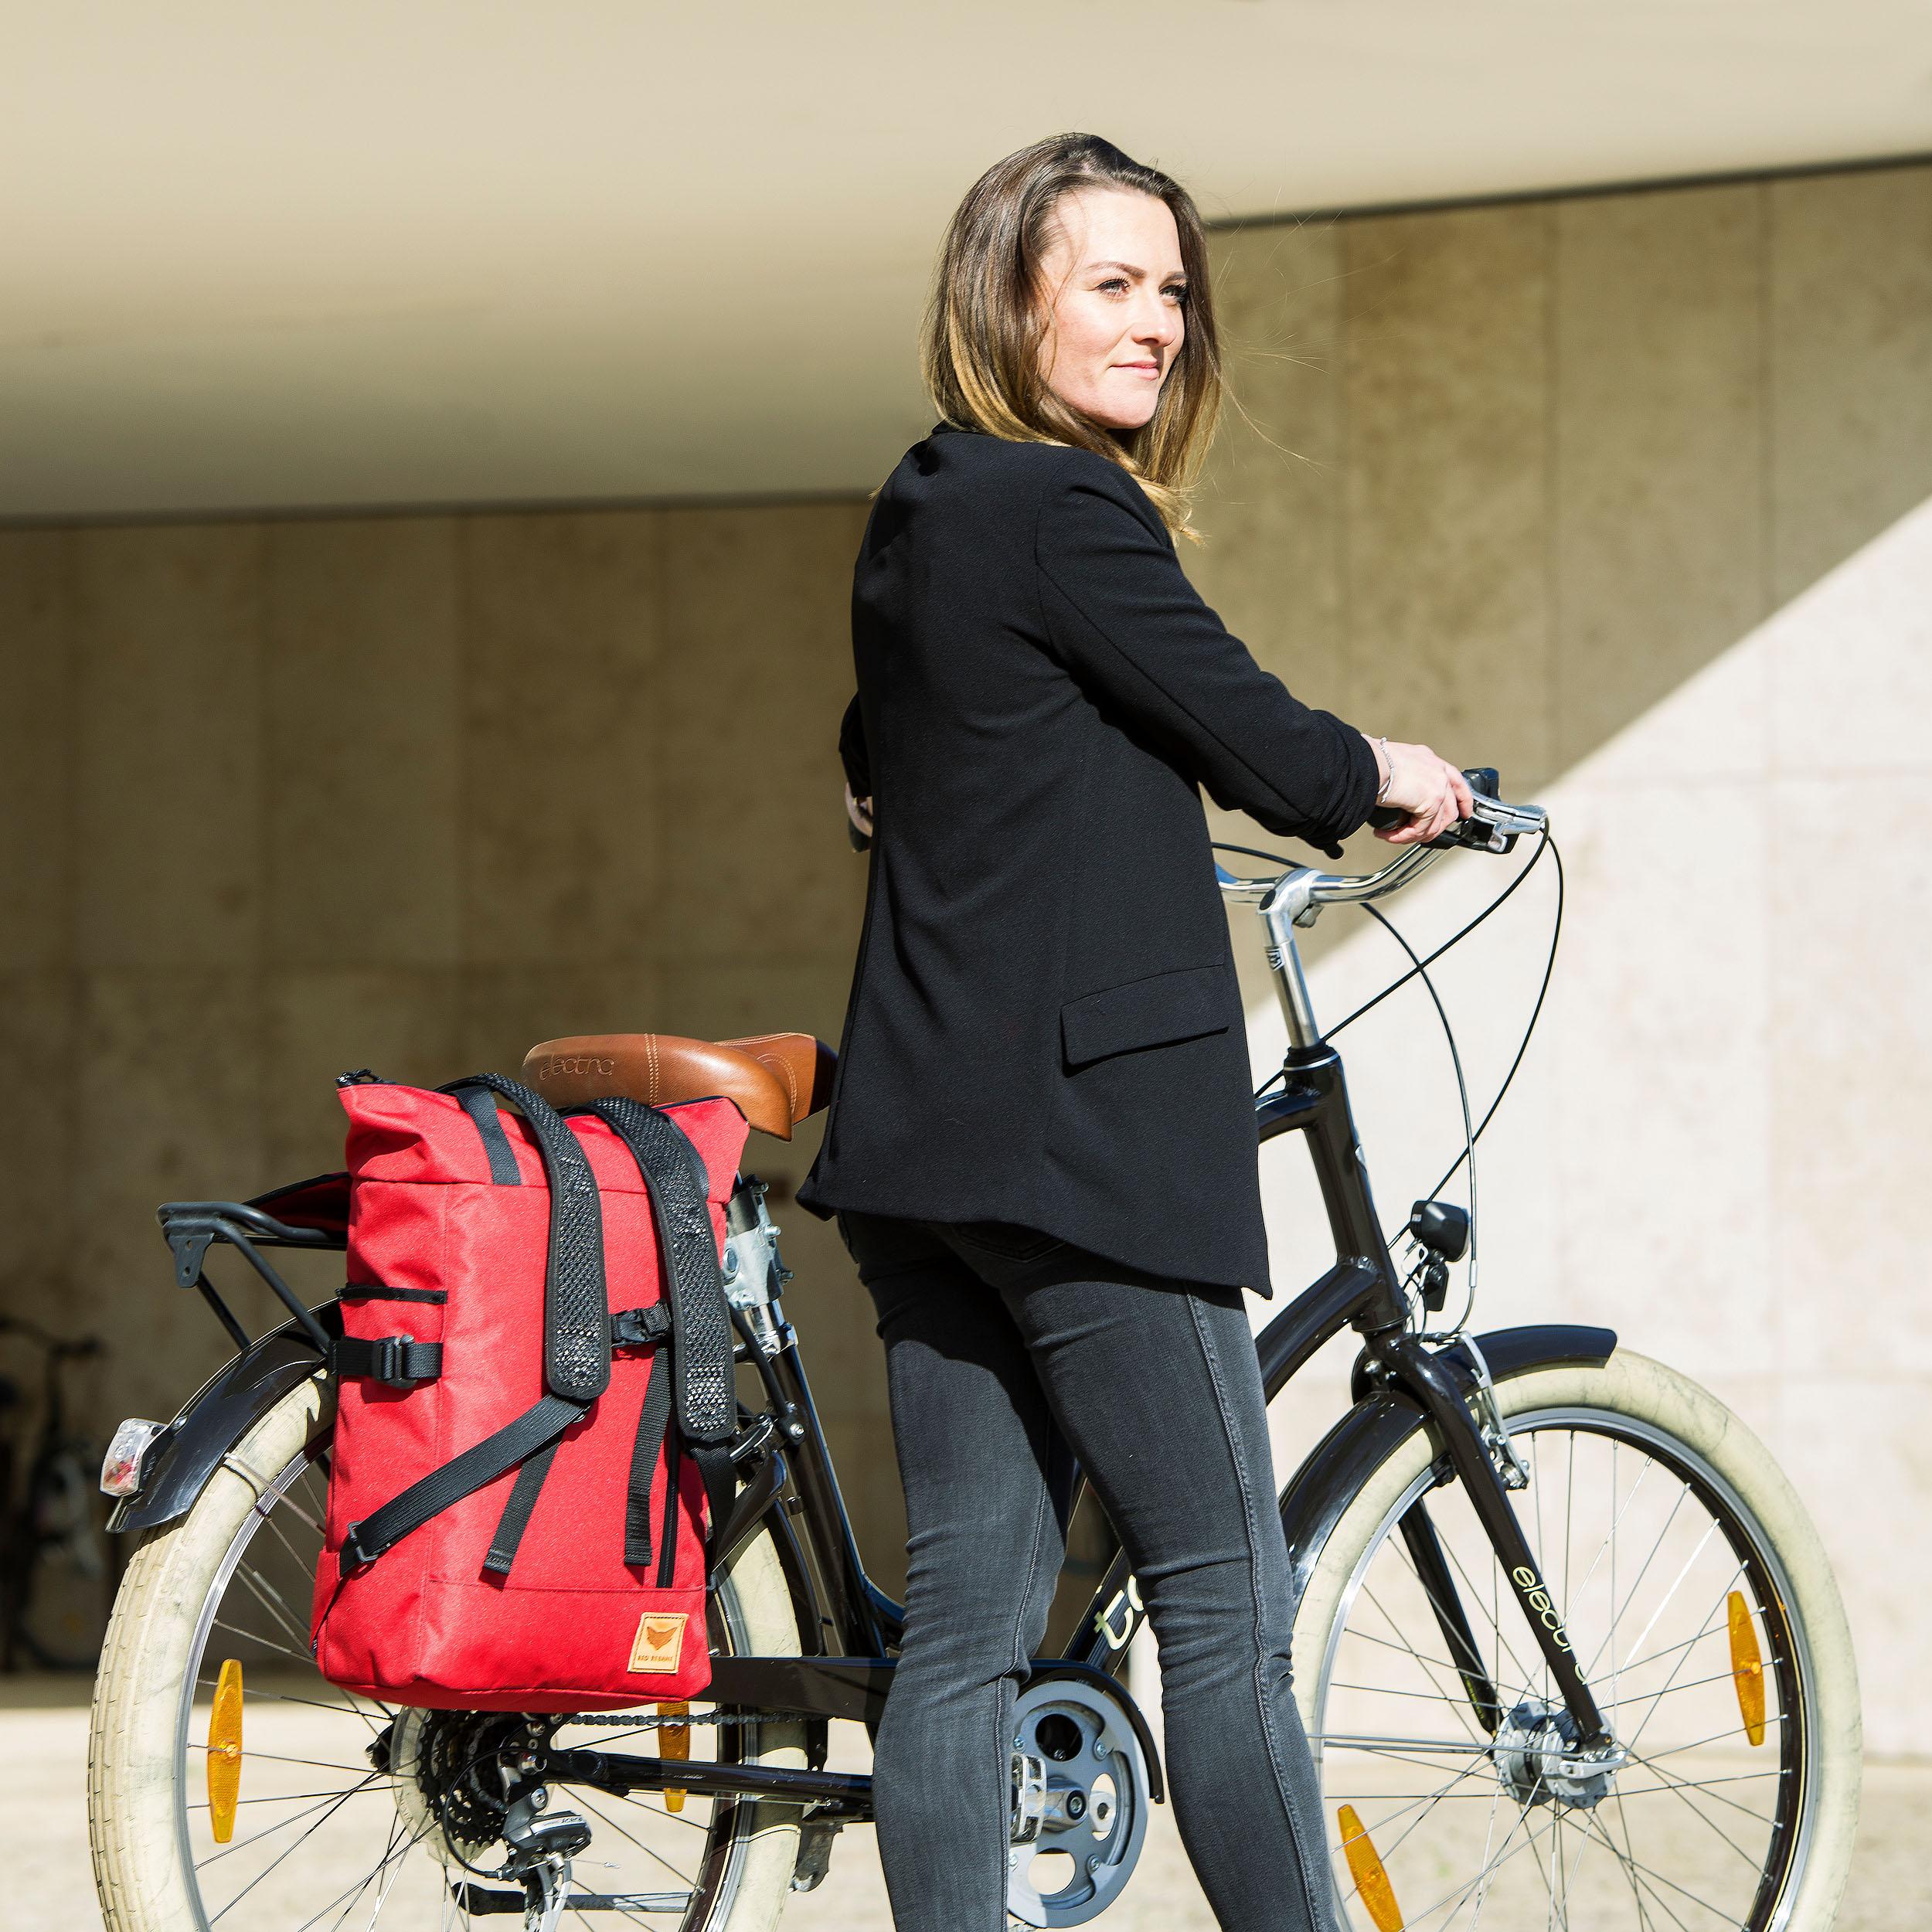 Rucksack auf dem Fahrrad